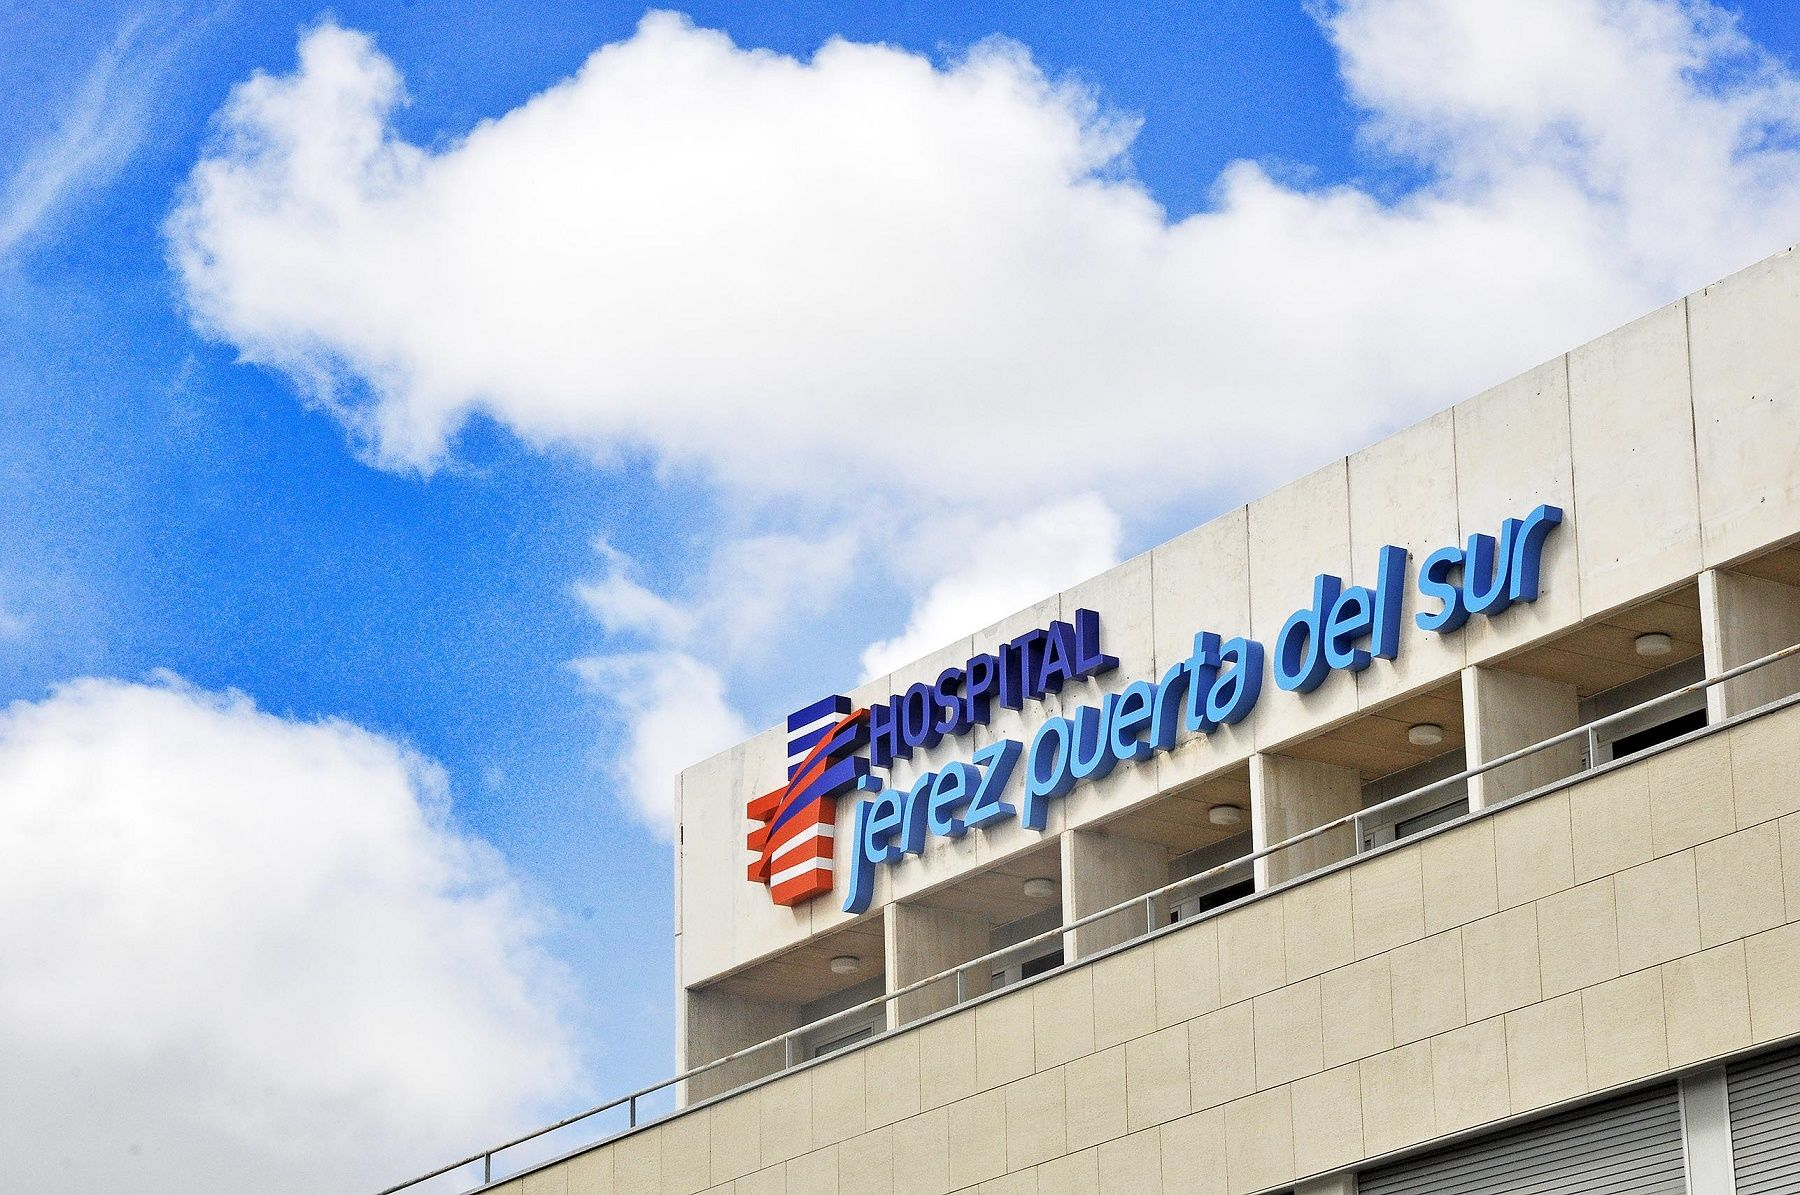 Foto 1- Hospital Jerez Puerta del Sur